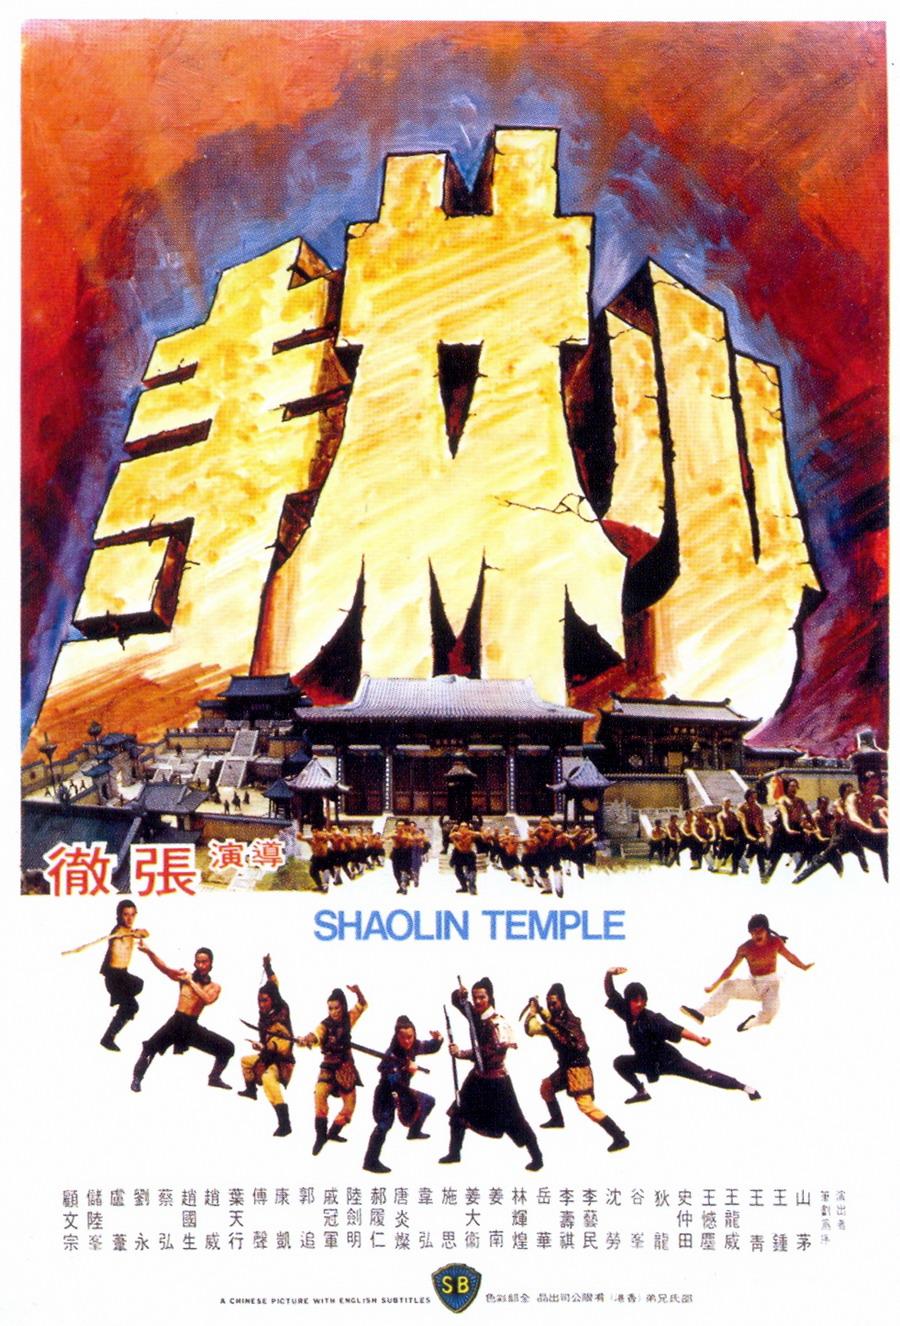 O Templo de Shaolin [Dub] – IMDB 7.0